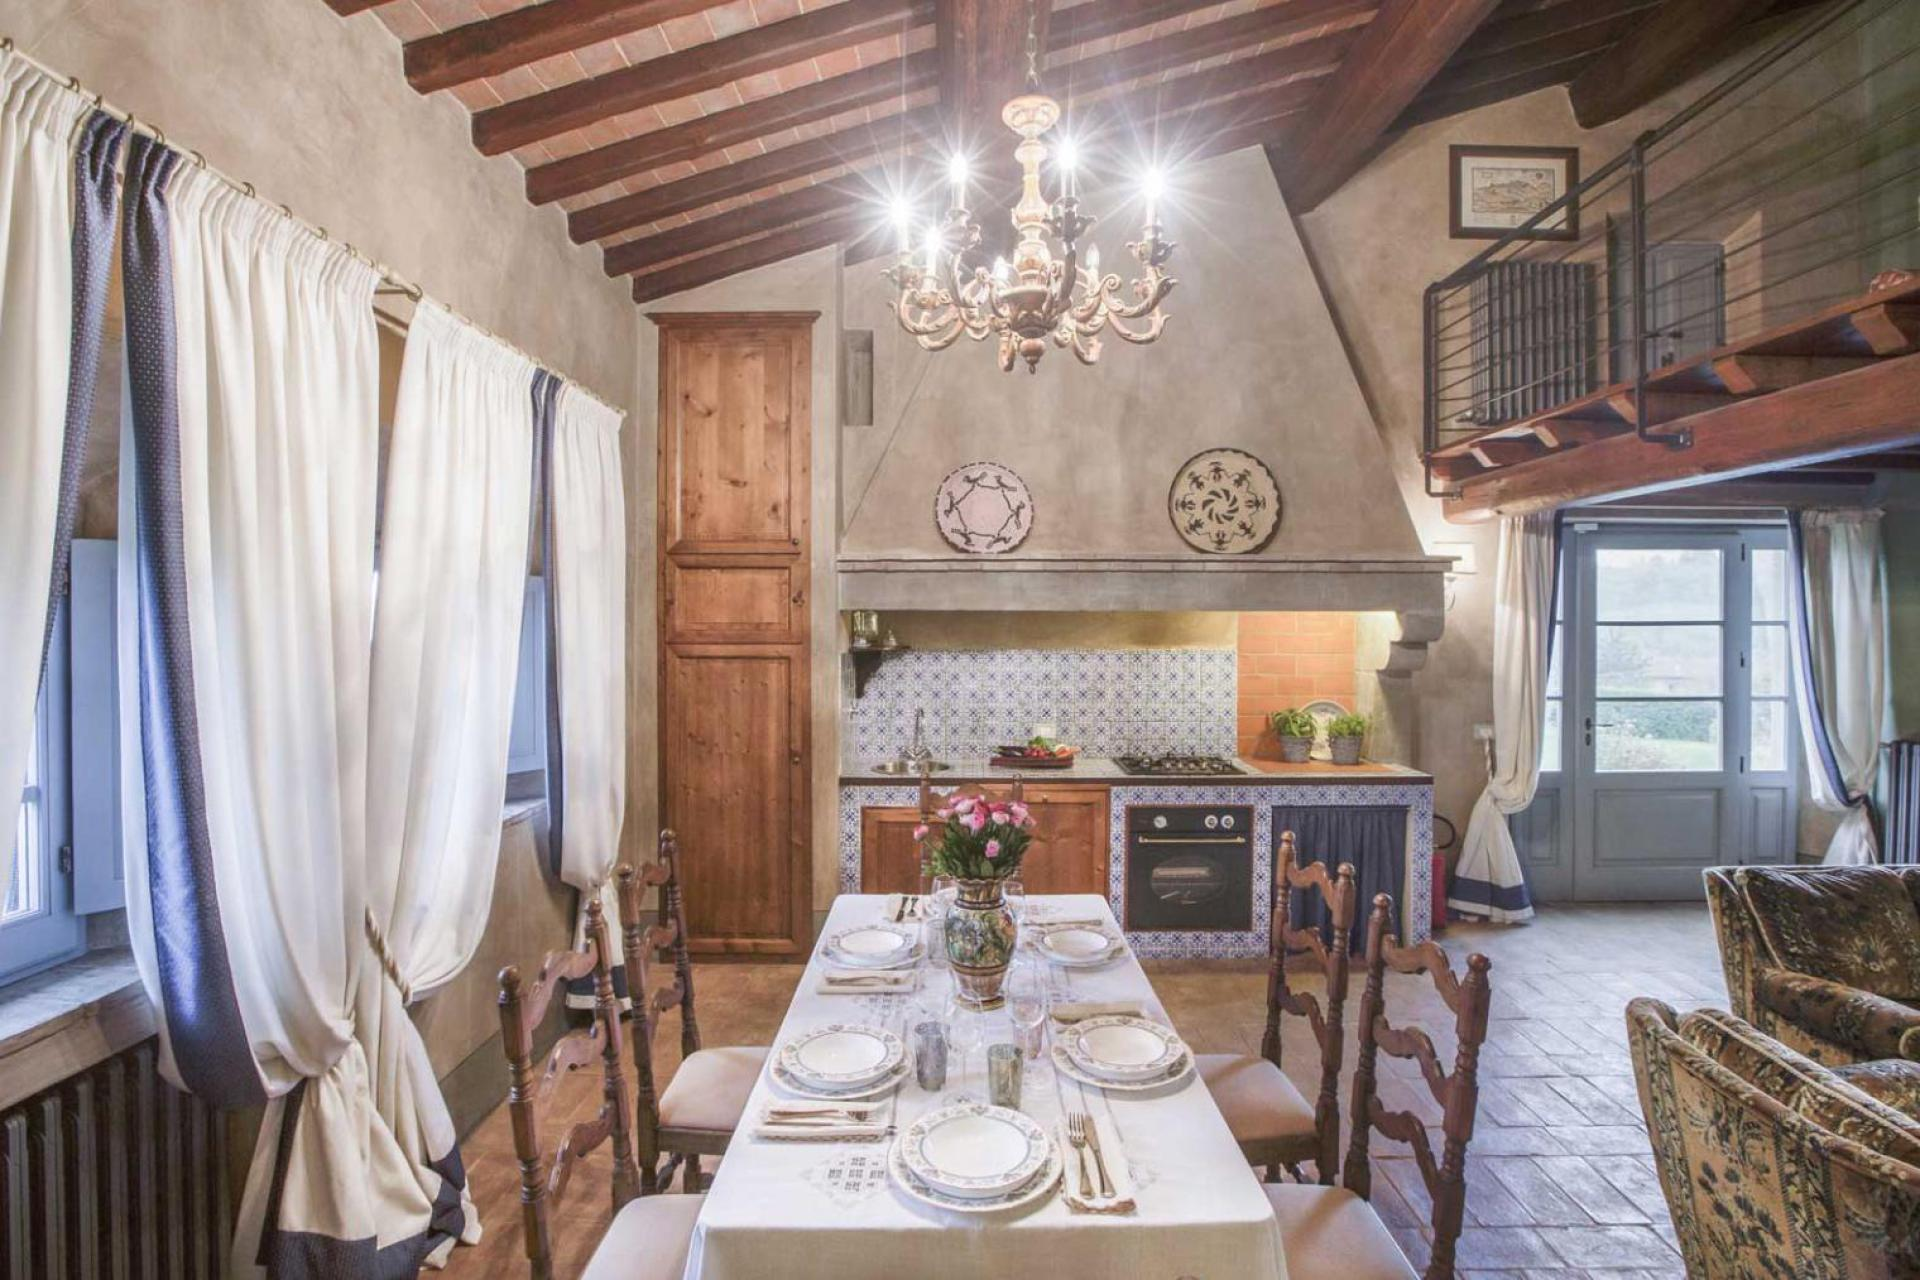 Agriturismo Tuscany Romantic agriturismo with views of San Gimignano